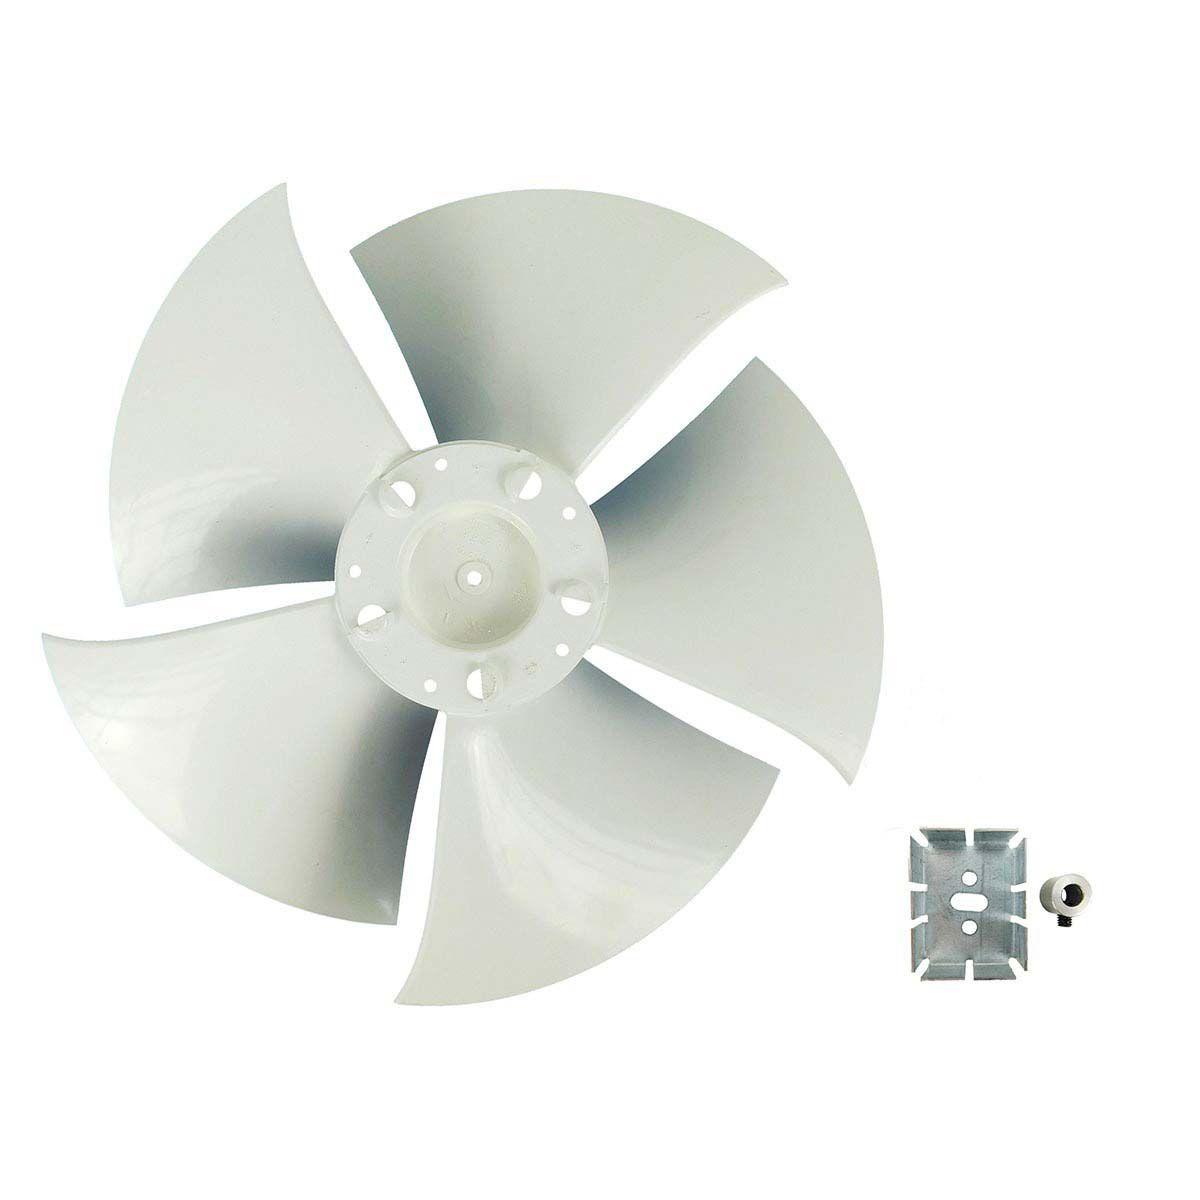 Hélice Hitachi Modelos RAP Capacidades 18.000 até 30.000 Btus HLB5249A Ø370mm